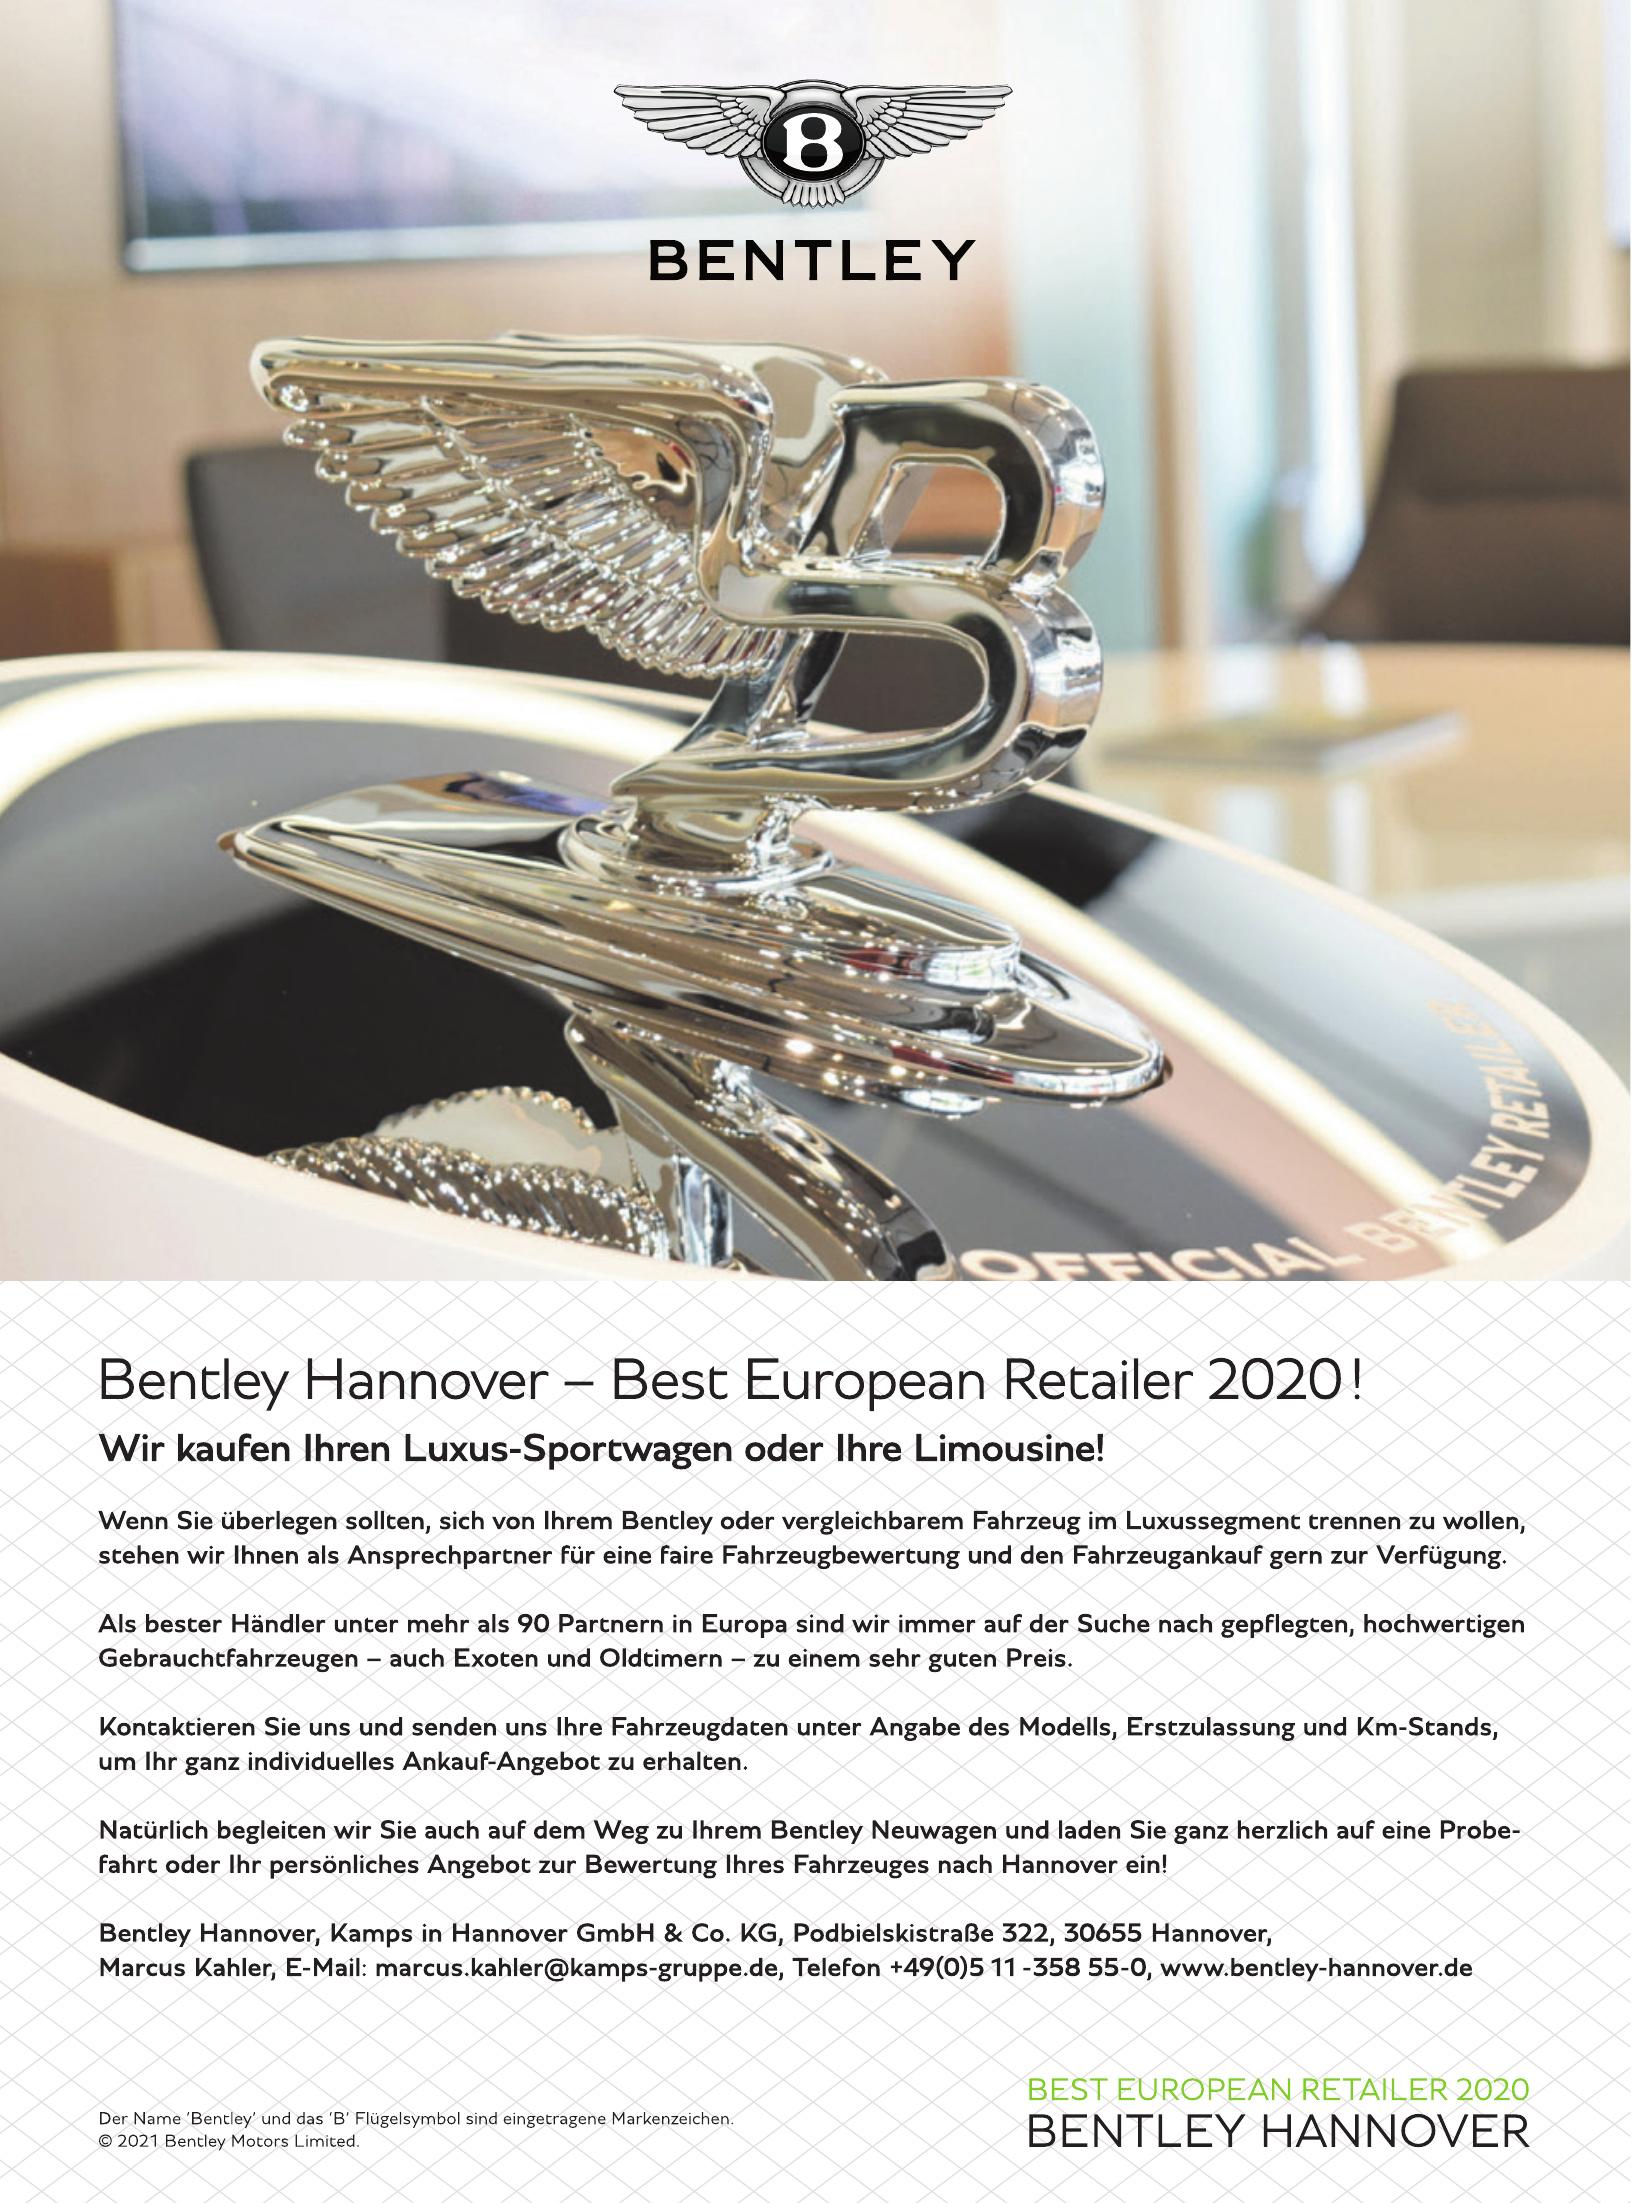 Bentley Hannover - Kamps in Hannover GmbH & Co. KG